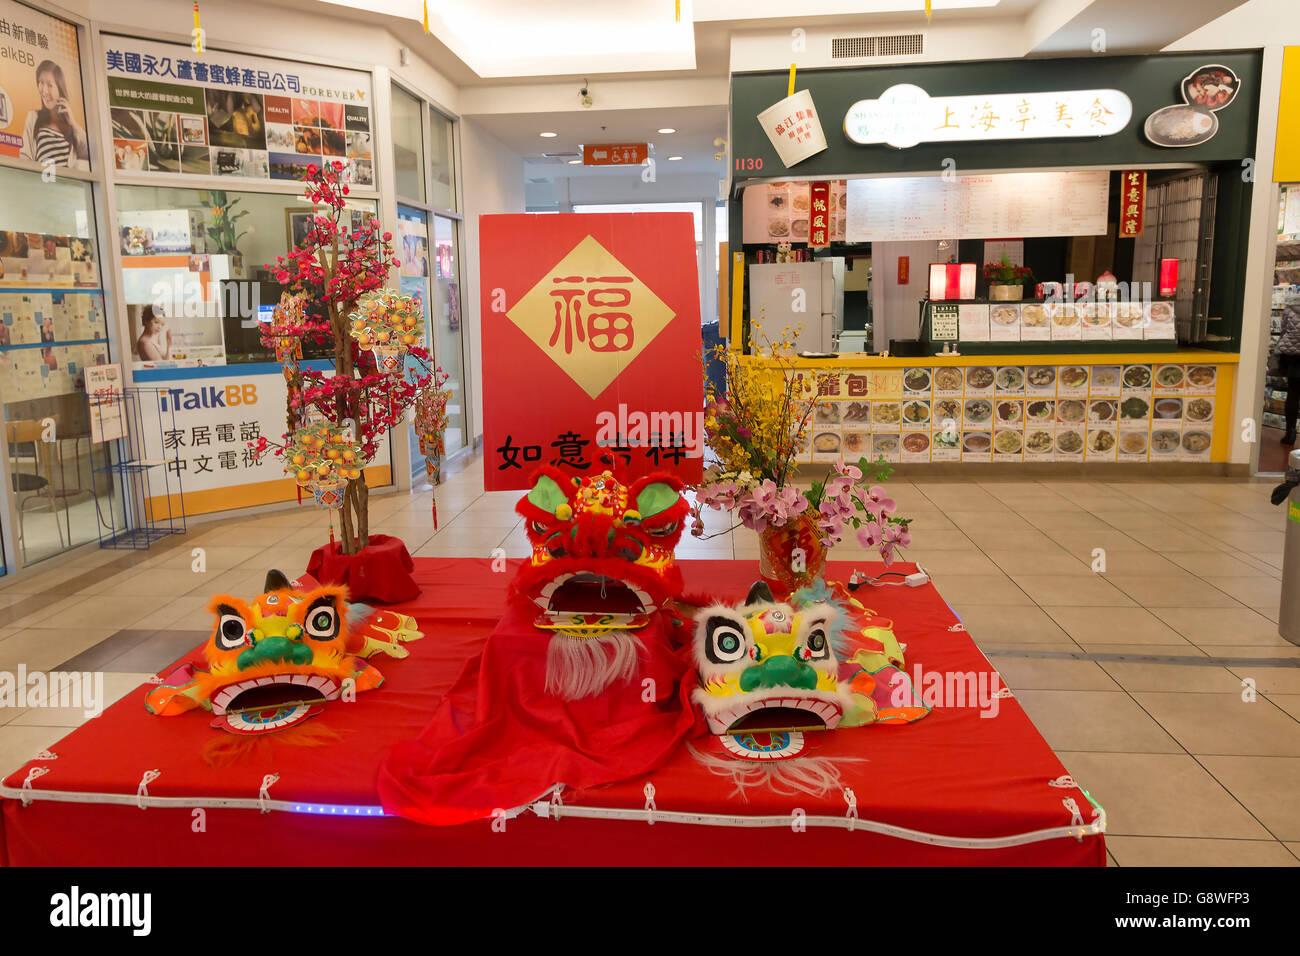 Asian Shopping Mall Stock Photos & Asian Shopping Mall Stock